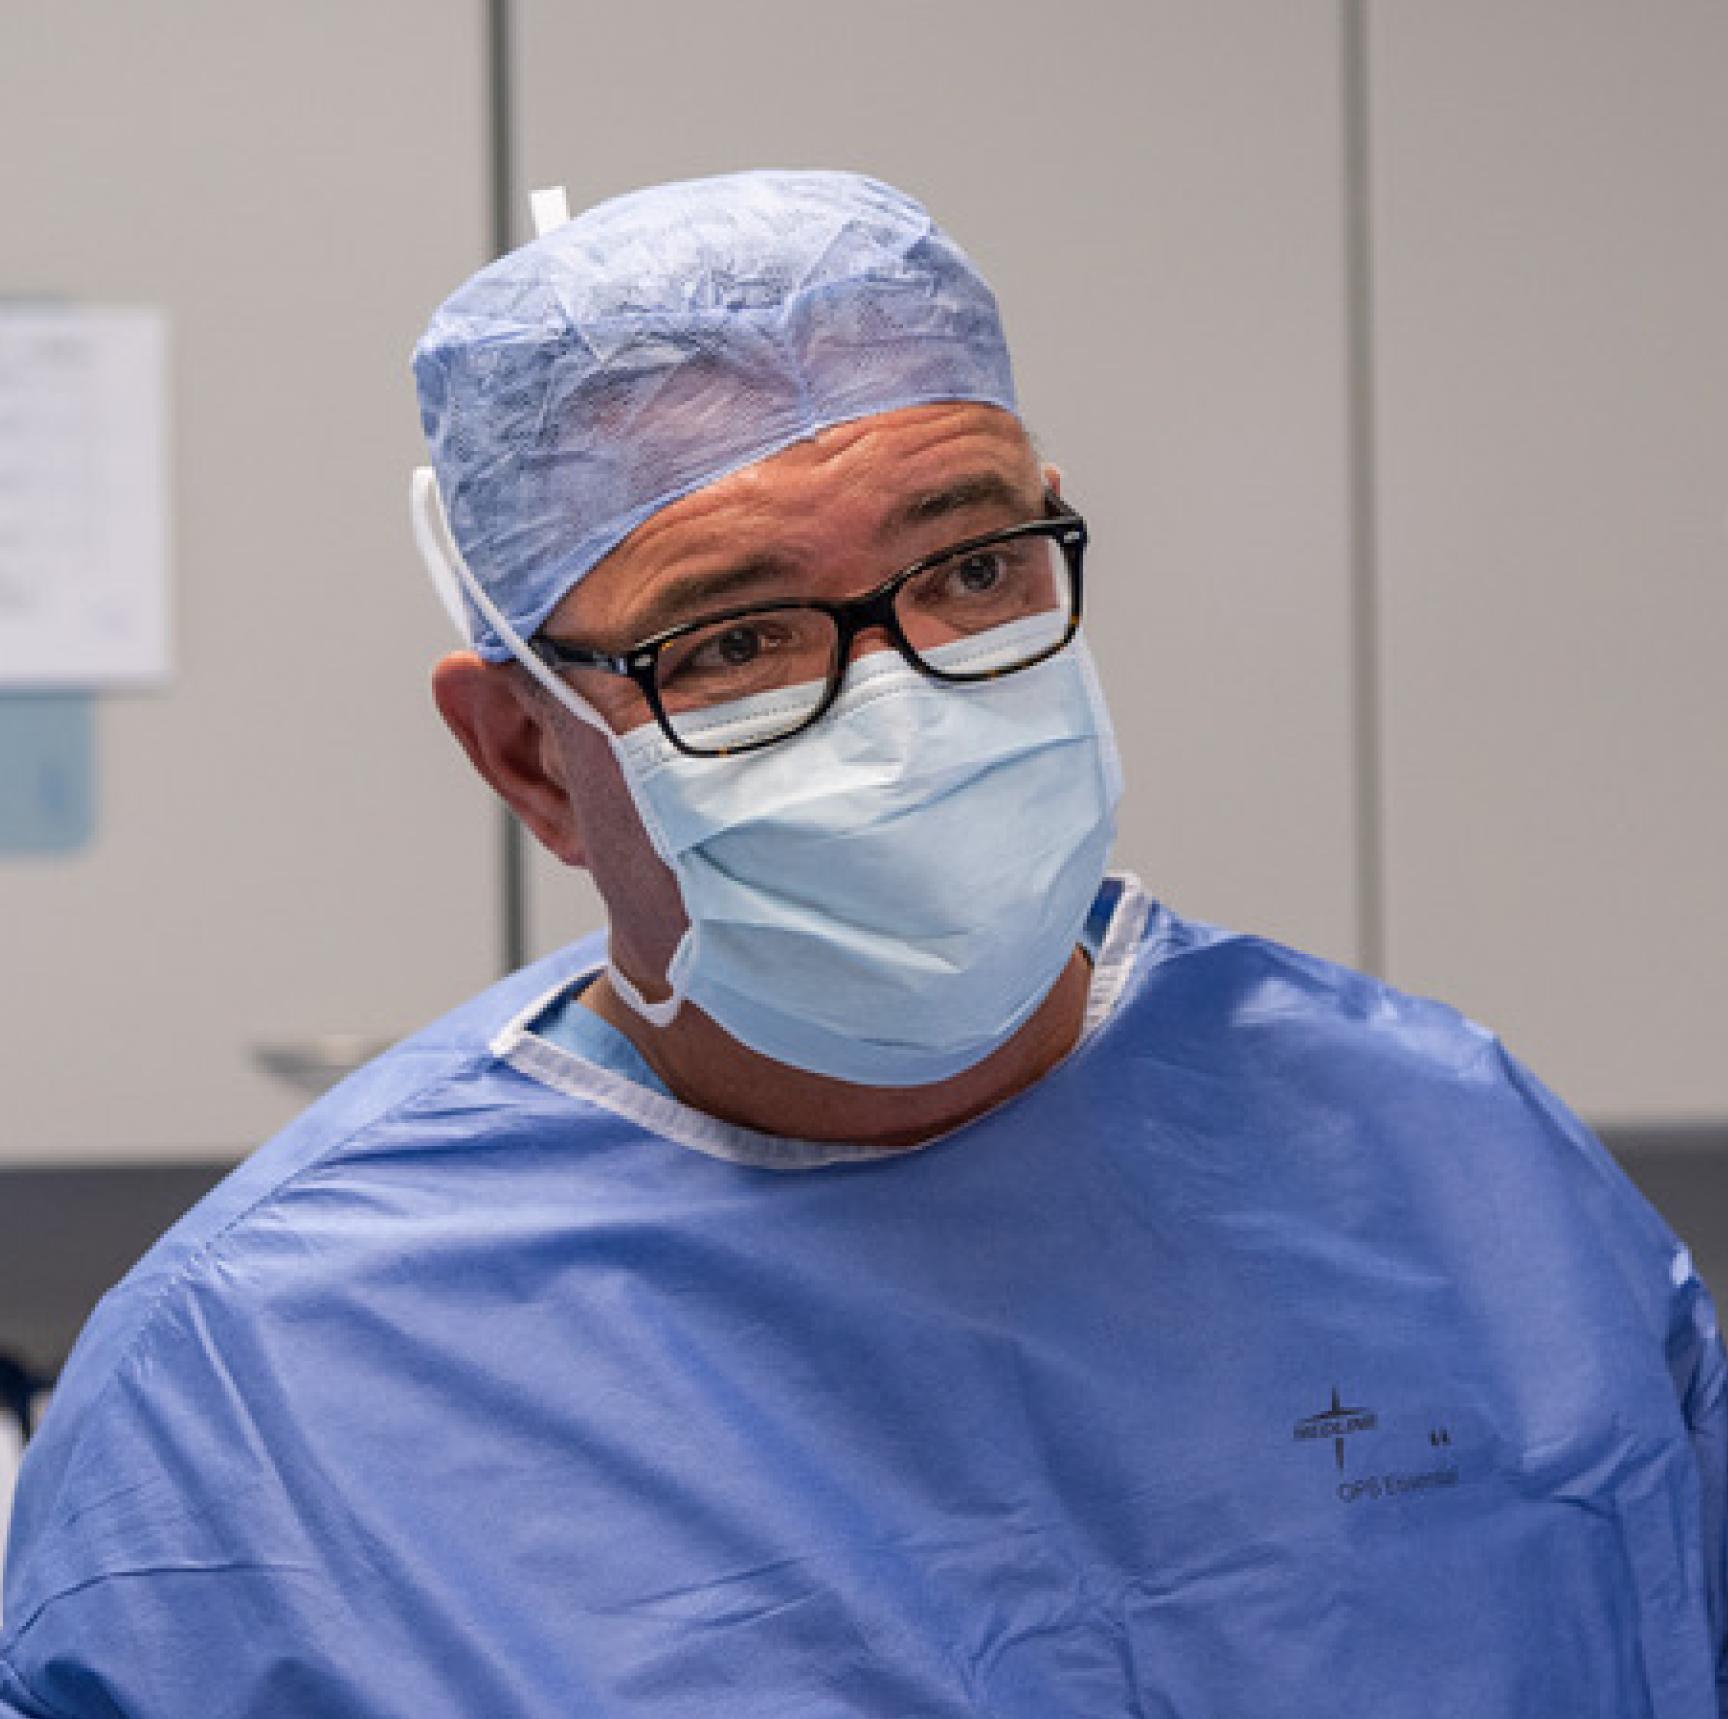 Dr Netzer Therapie - Liposuktion